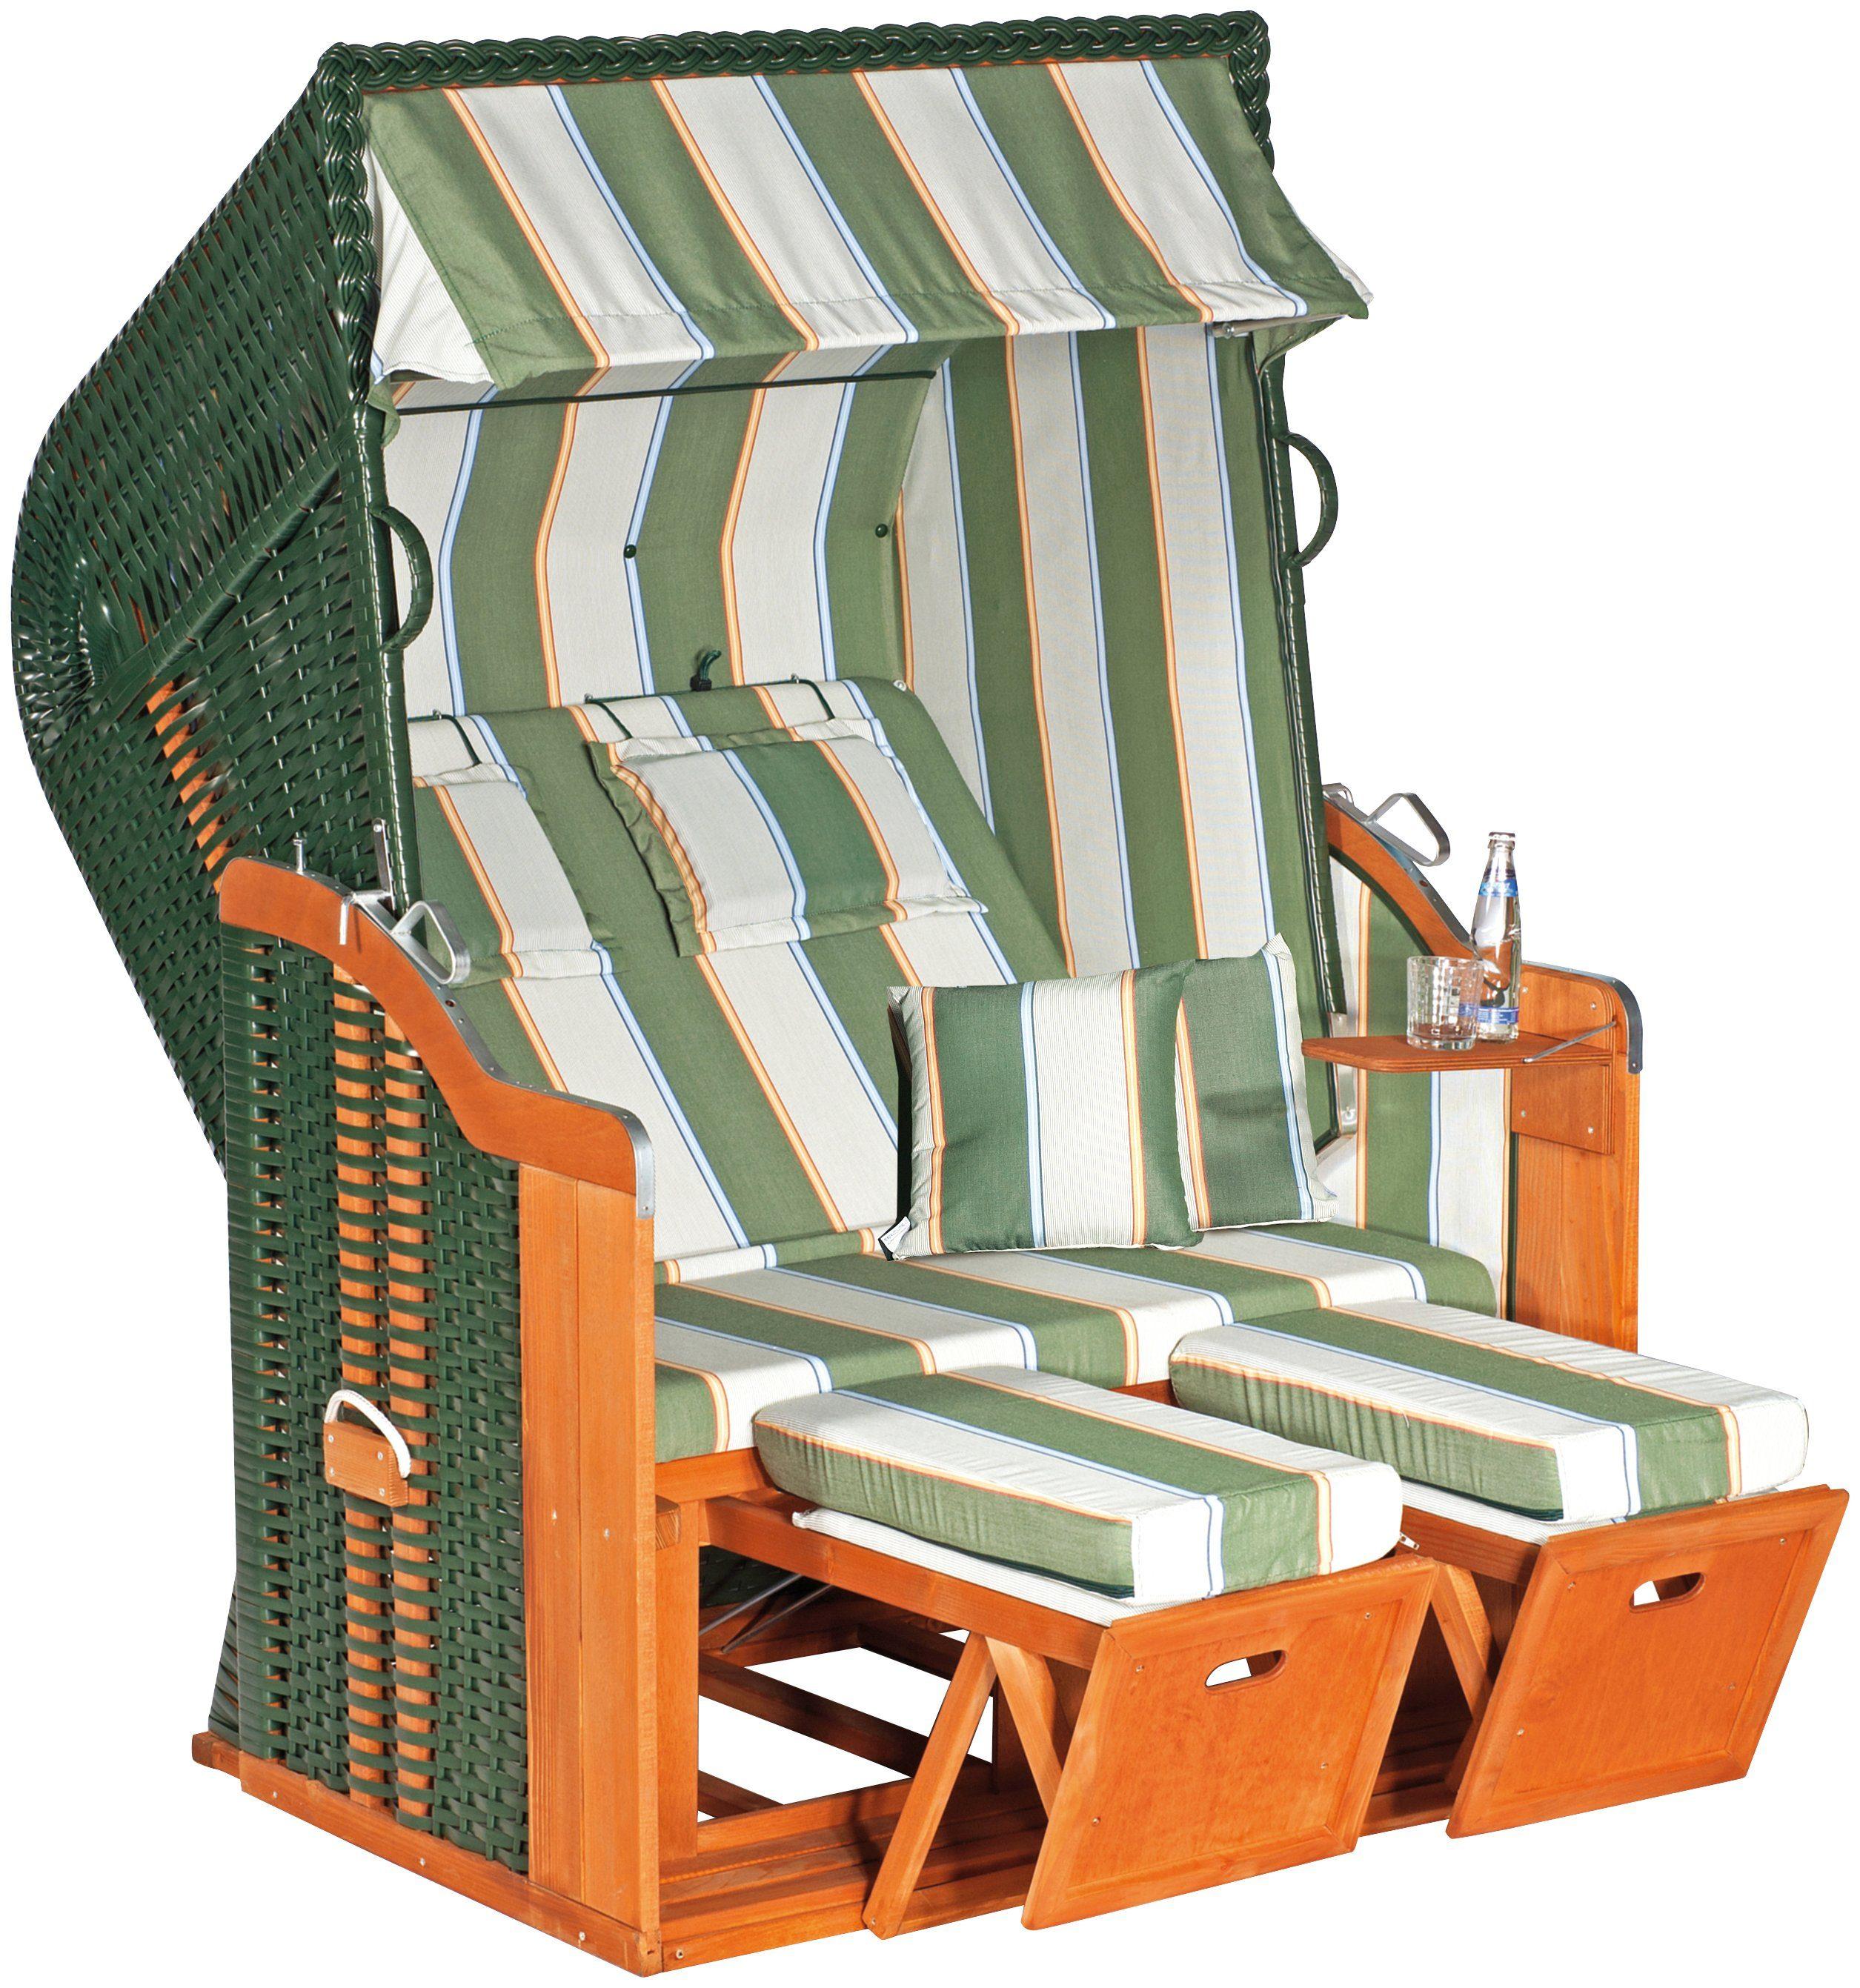 SUNNY SMART Strandkorb »Rustikal 250 Plus 1202«, BxTxH: 125x90x160 cm, grün